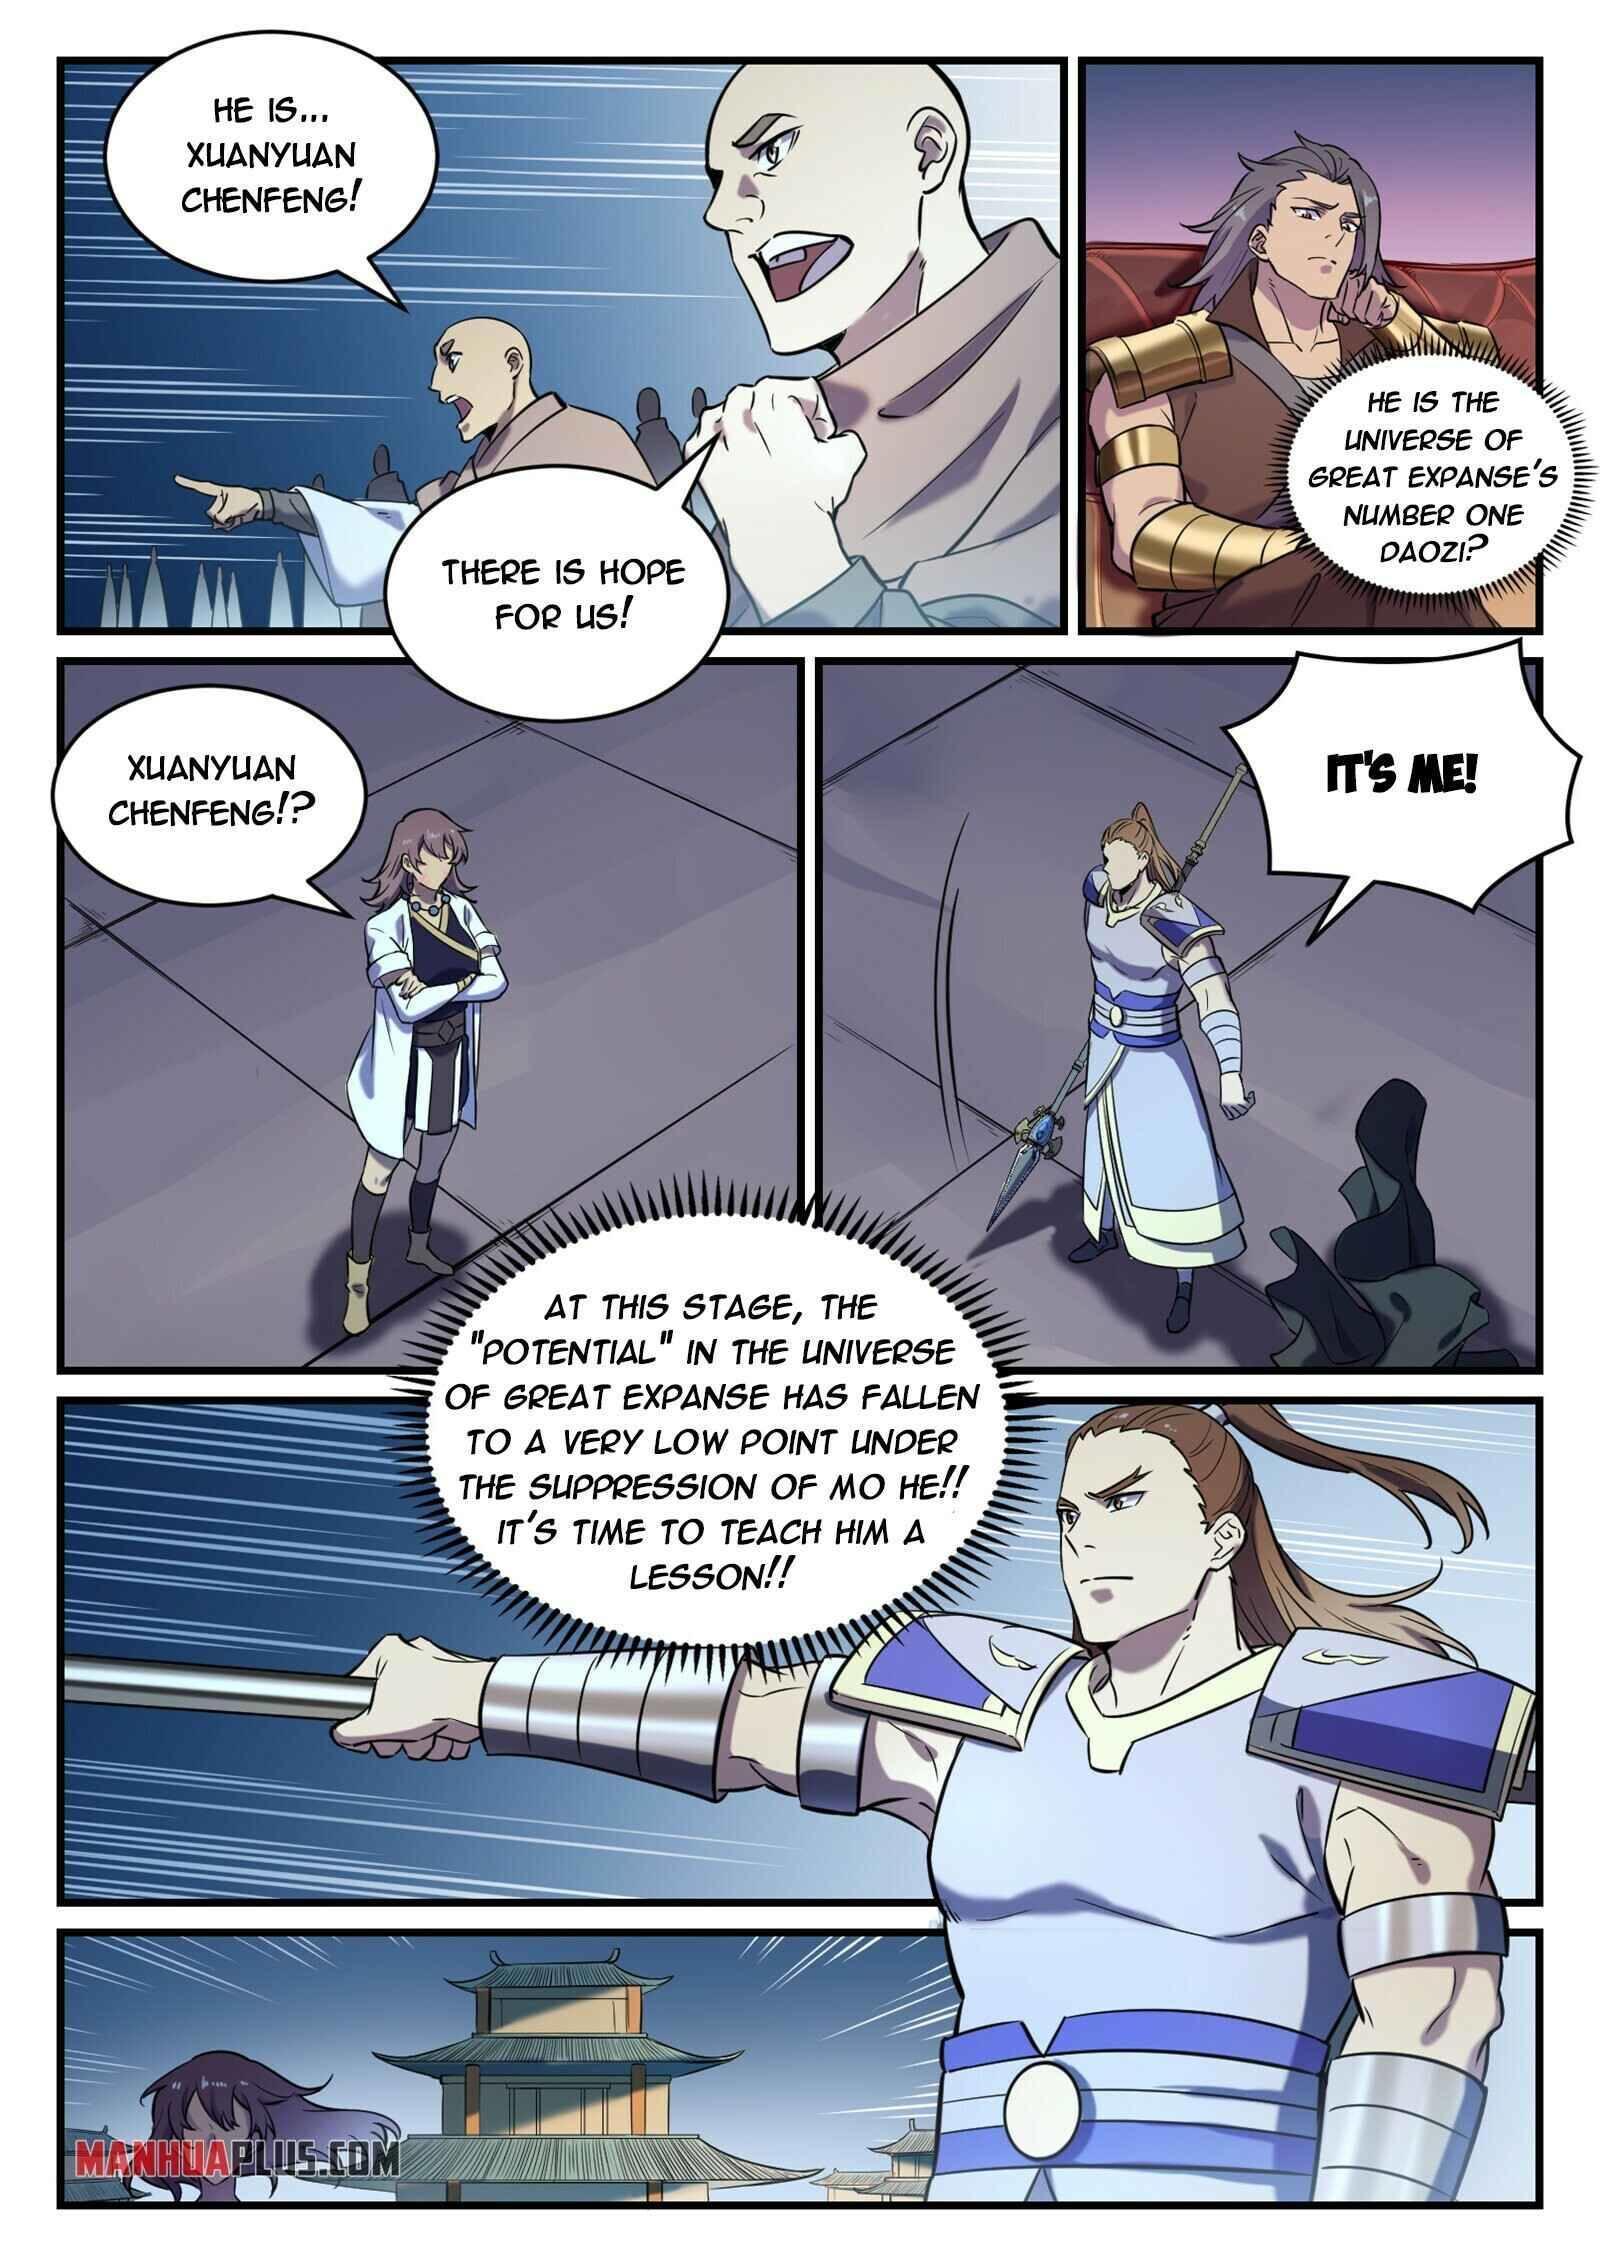 Apotheosis Chapter 805 page 4 - Mangakakalot